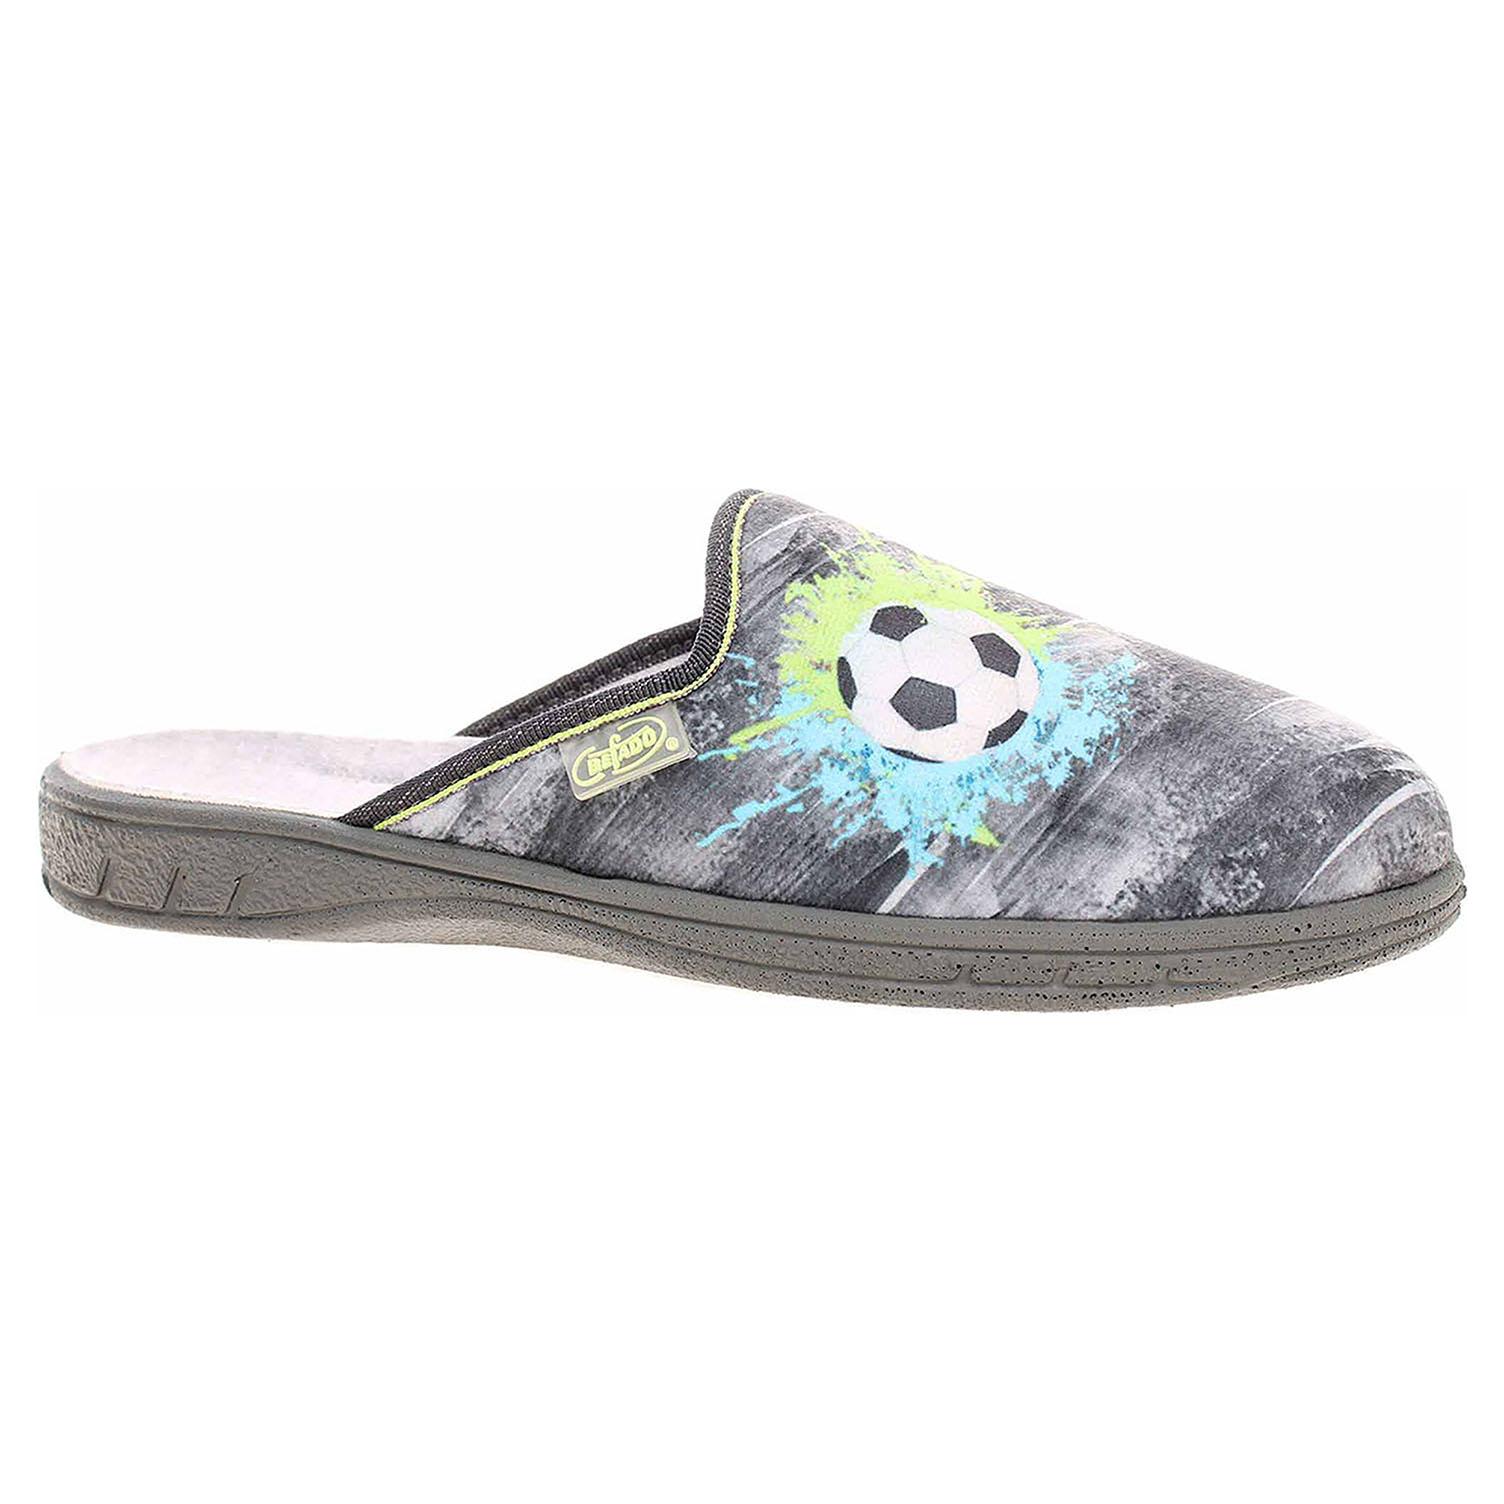 Befado chlapecké domácí pantofle 707Y395 šedá 707Y395 33